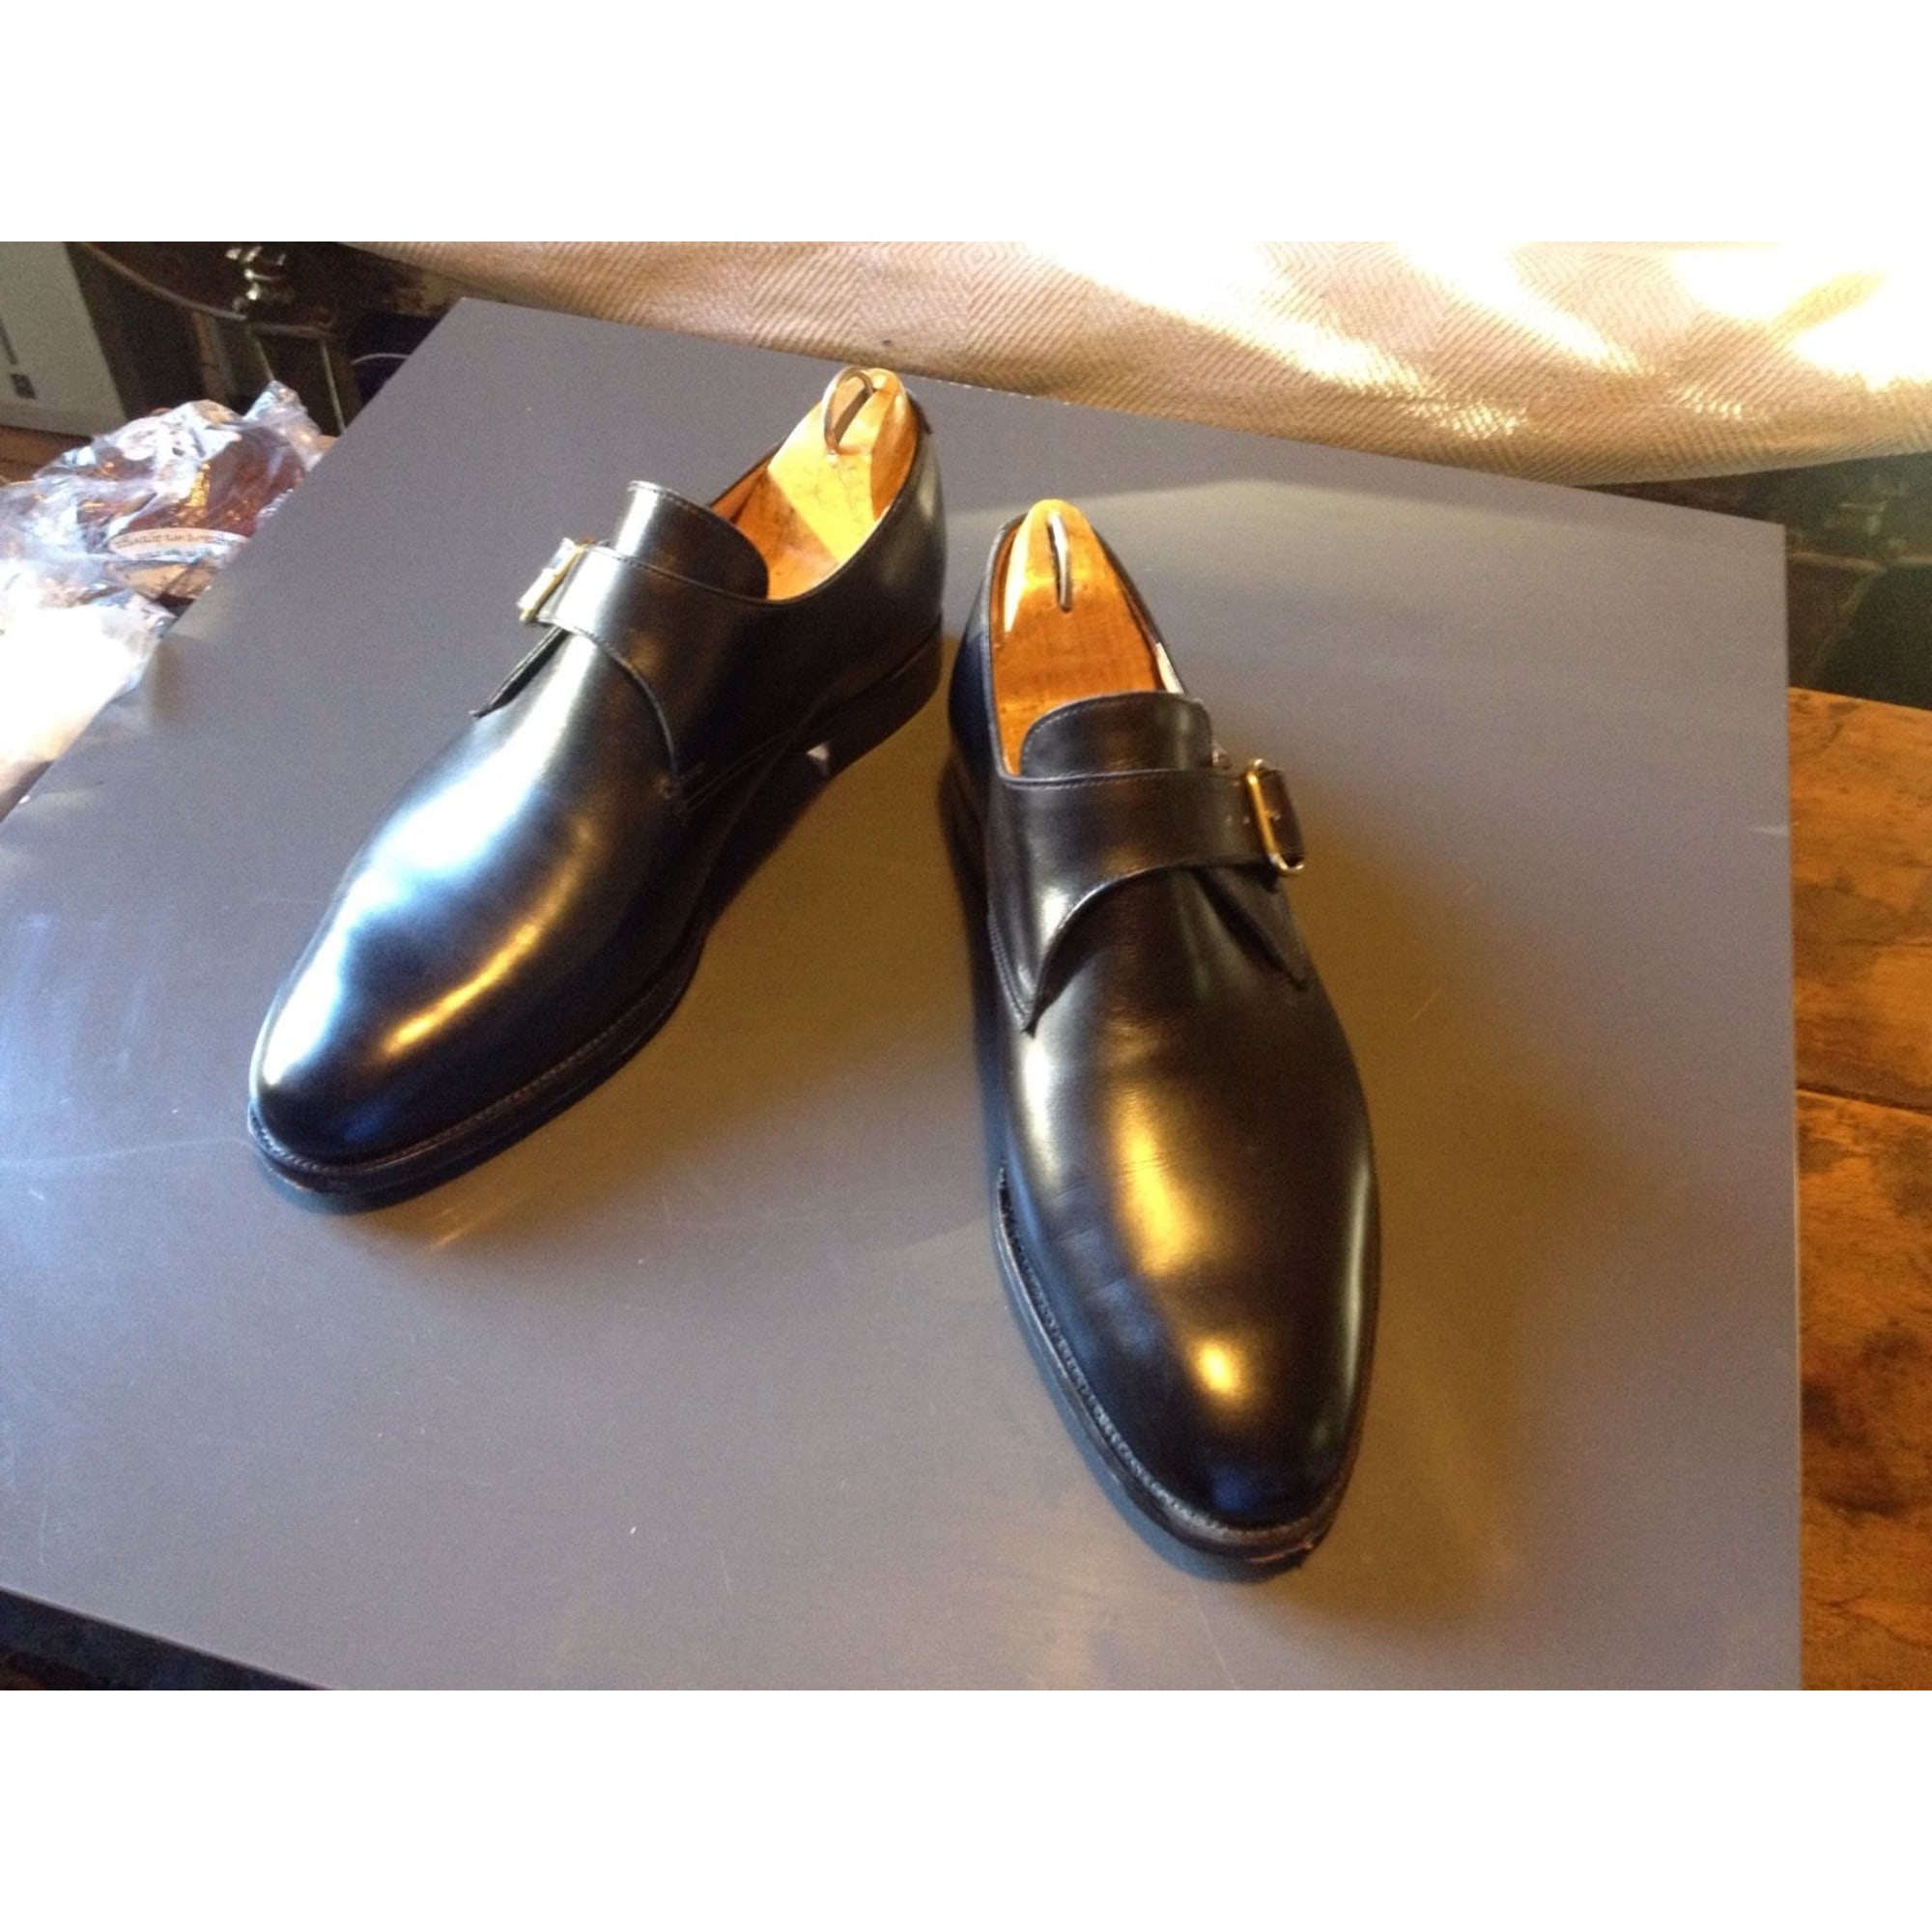 Chaussures à boucles JOHN LOBB 42 noir - 3291403 80b2f43cbb8